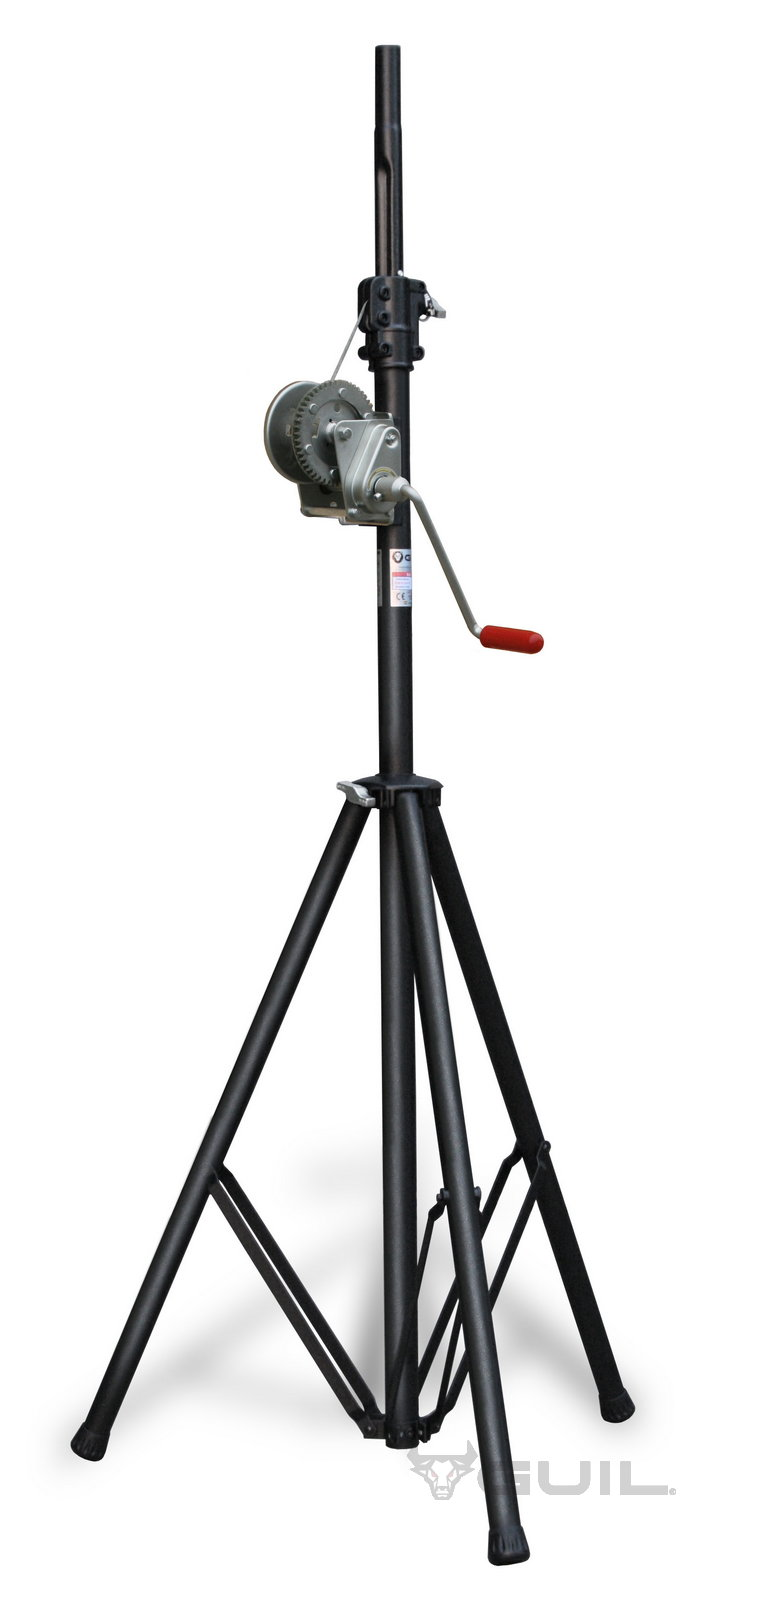 Materiaallift 1,7-3,3 m 85 kg (dutch) (1)